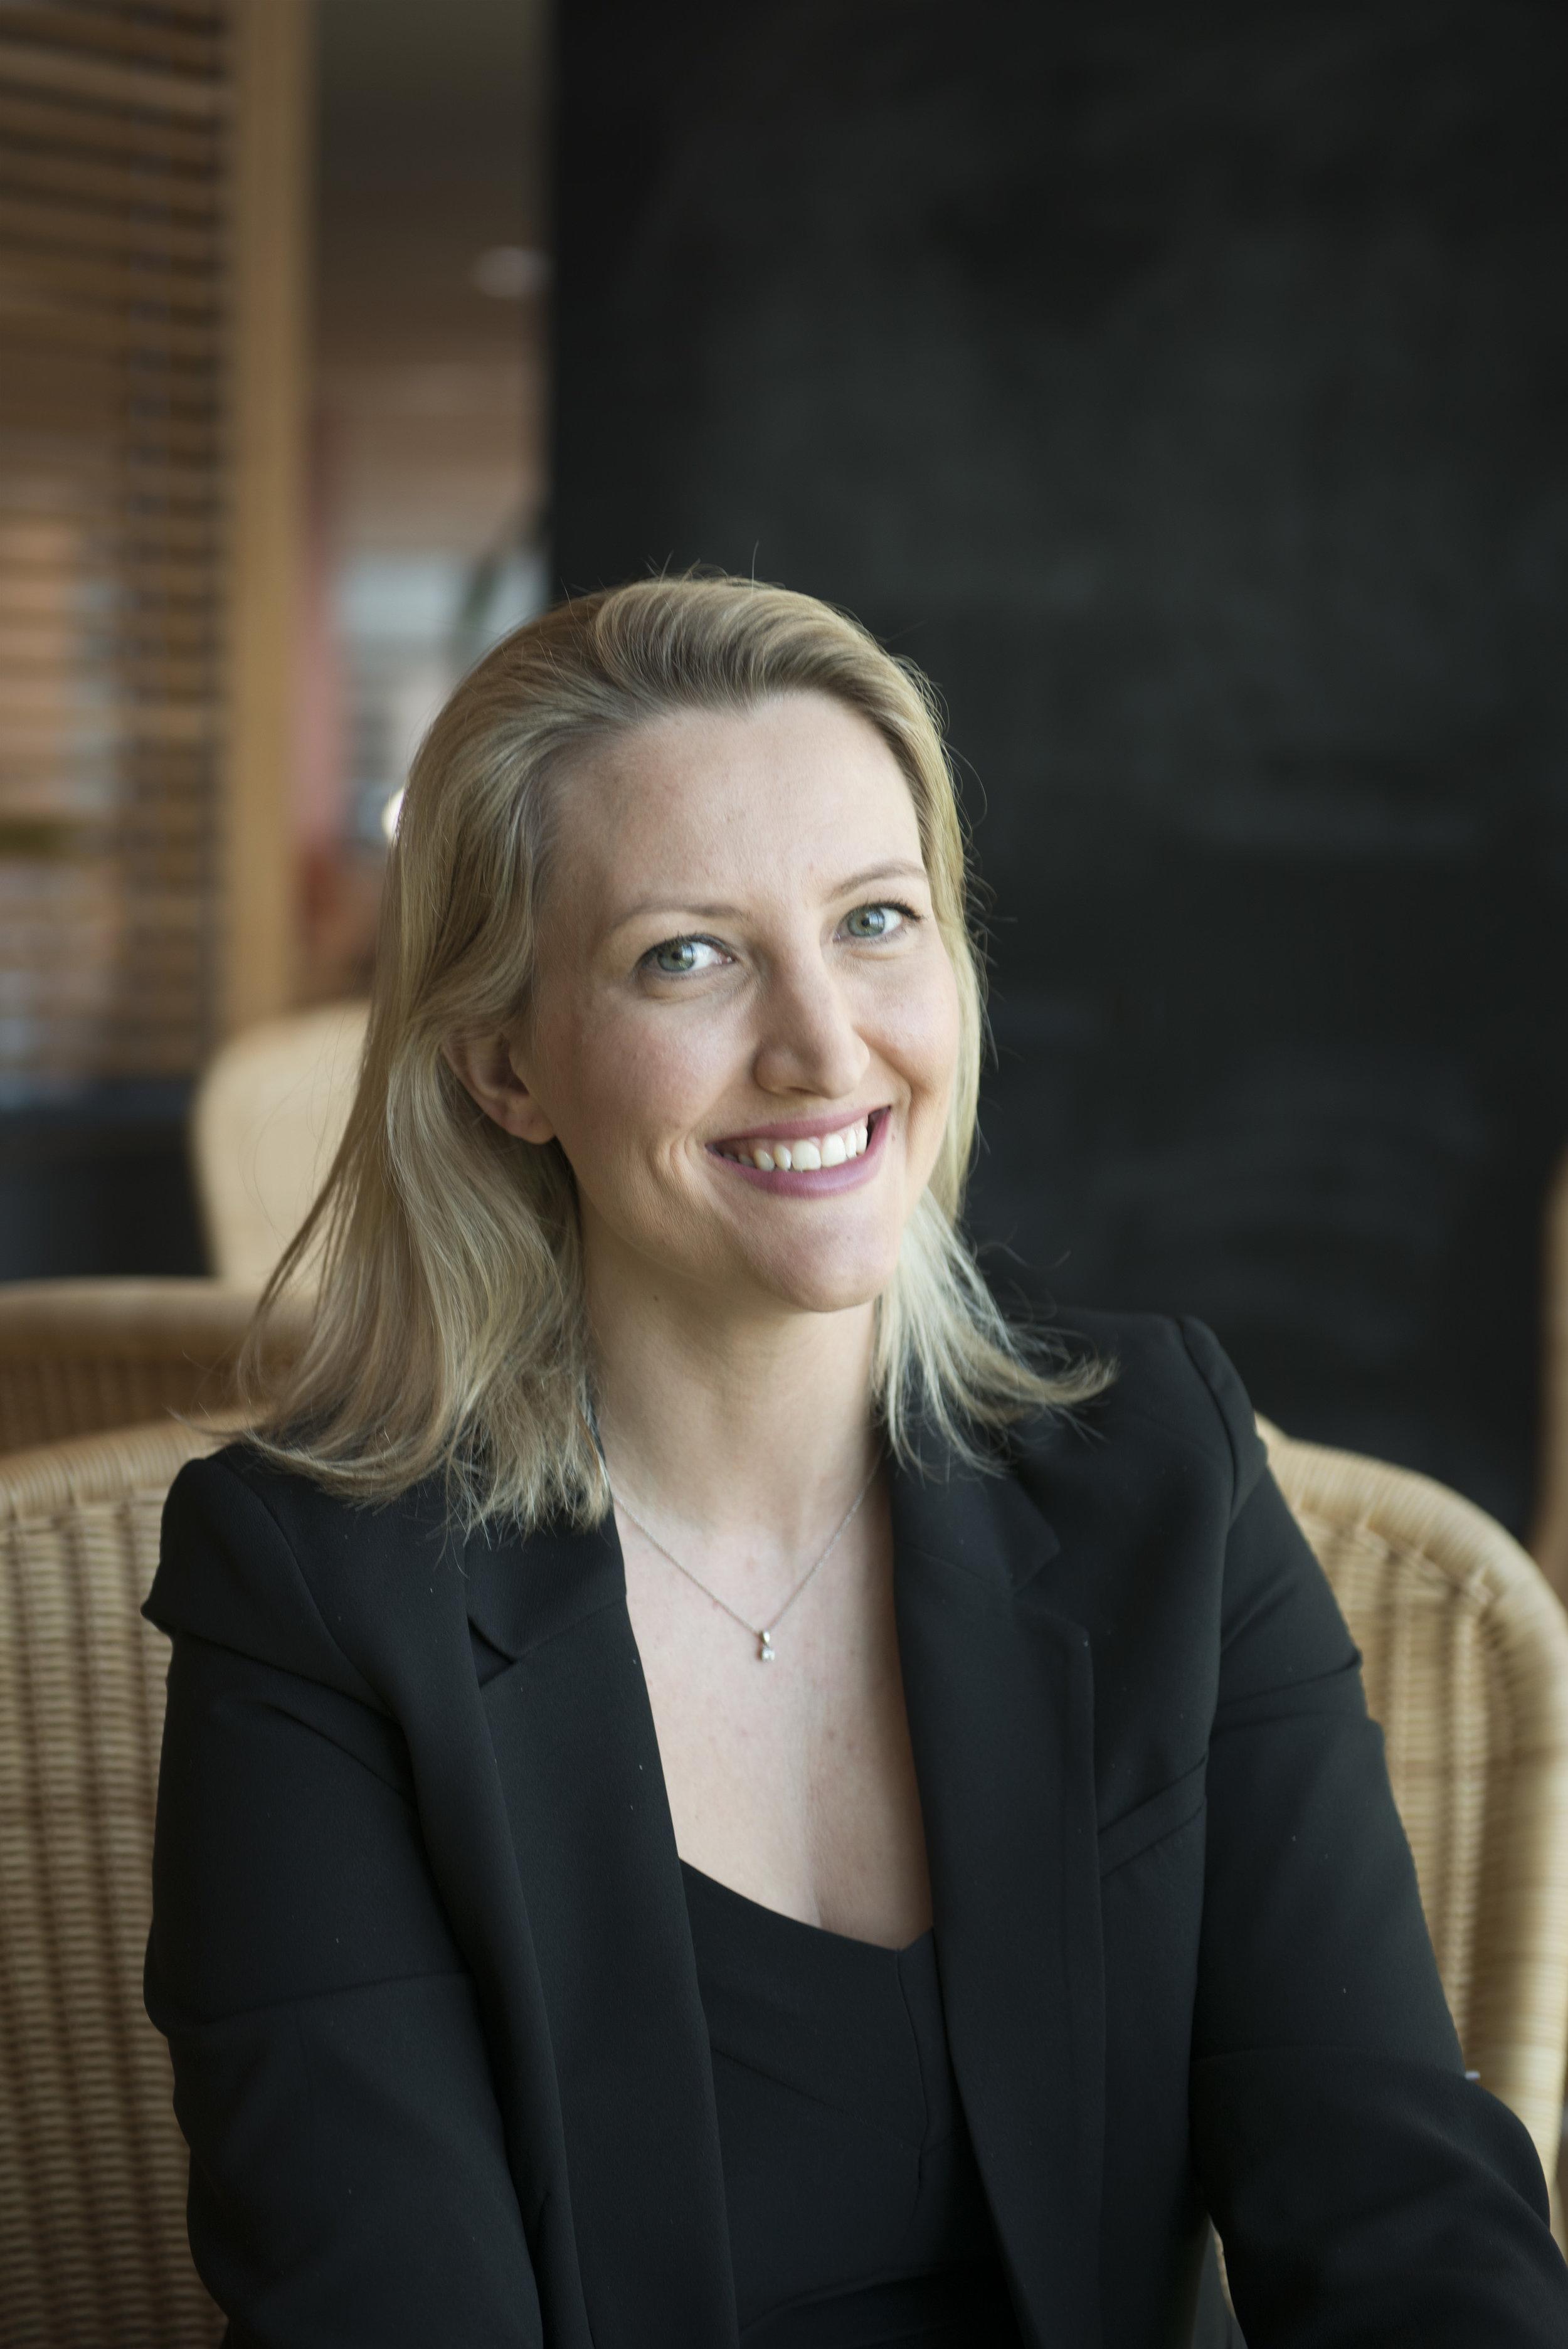 Catherine Ball, CEO, Speaker, Co-Founder, Communicator, Entrepreneur, and Humanitarian.